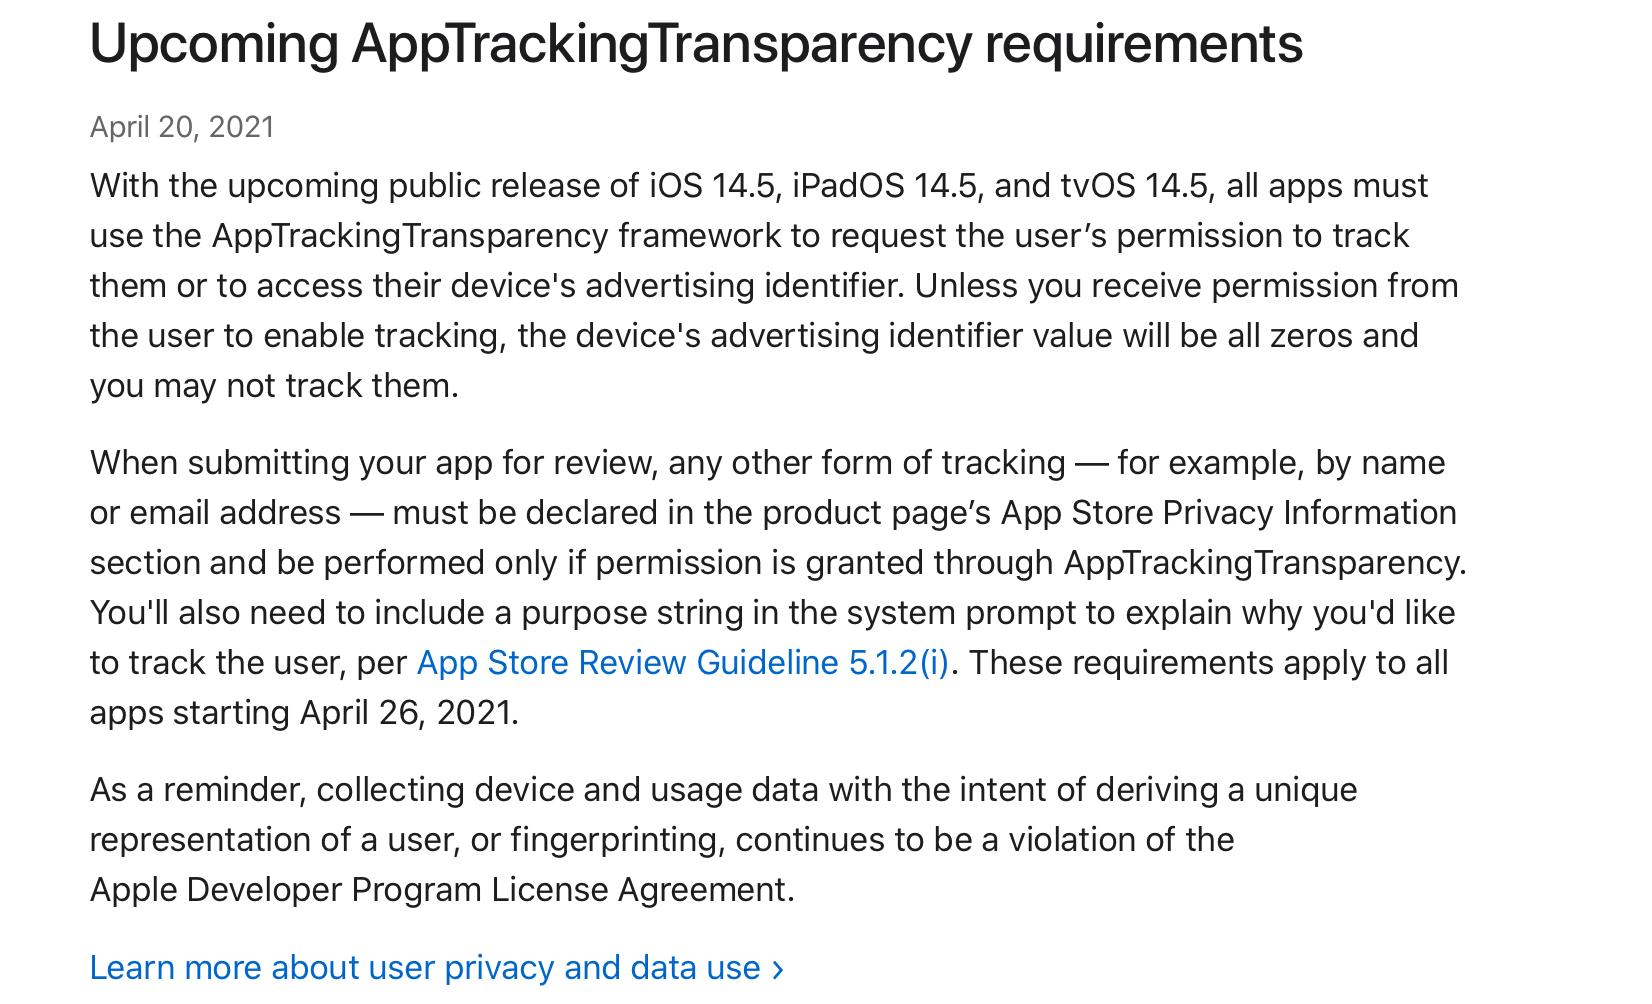 ATT tracking Facebook update from blog post